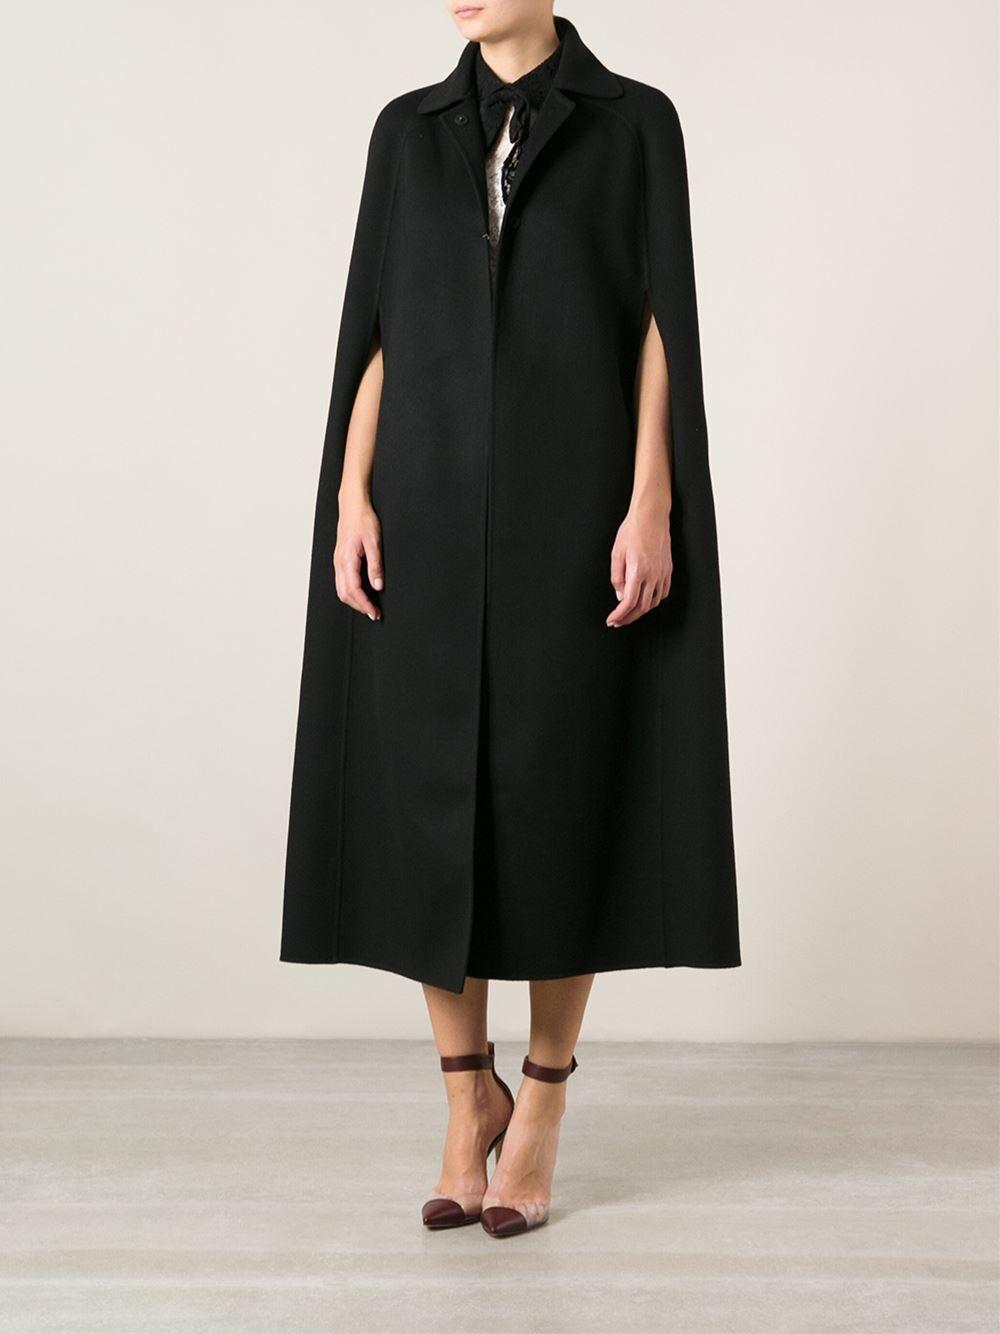 Valentino Cape Coat In Black Lyst